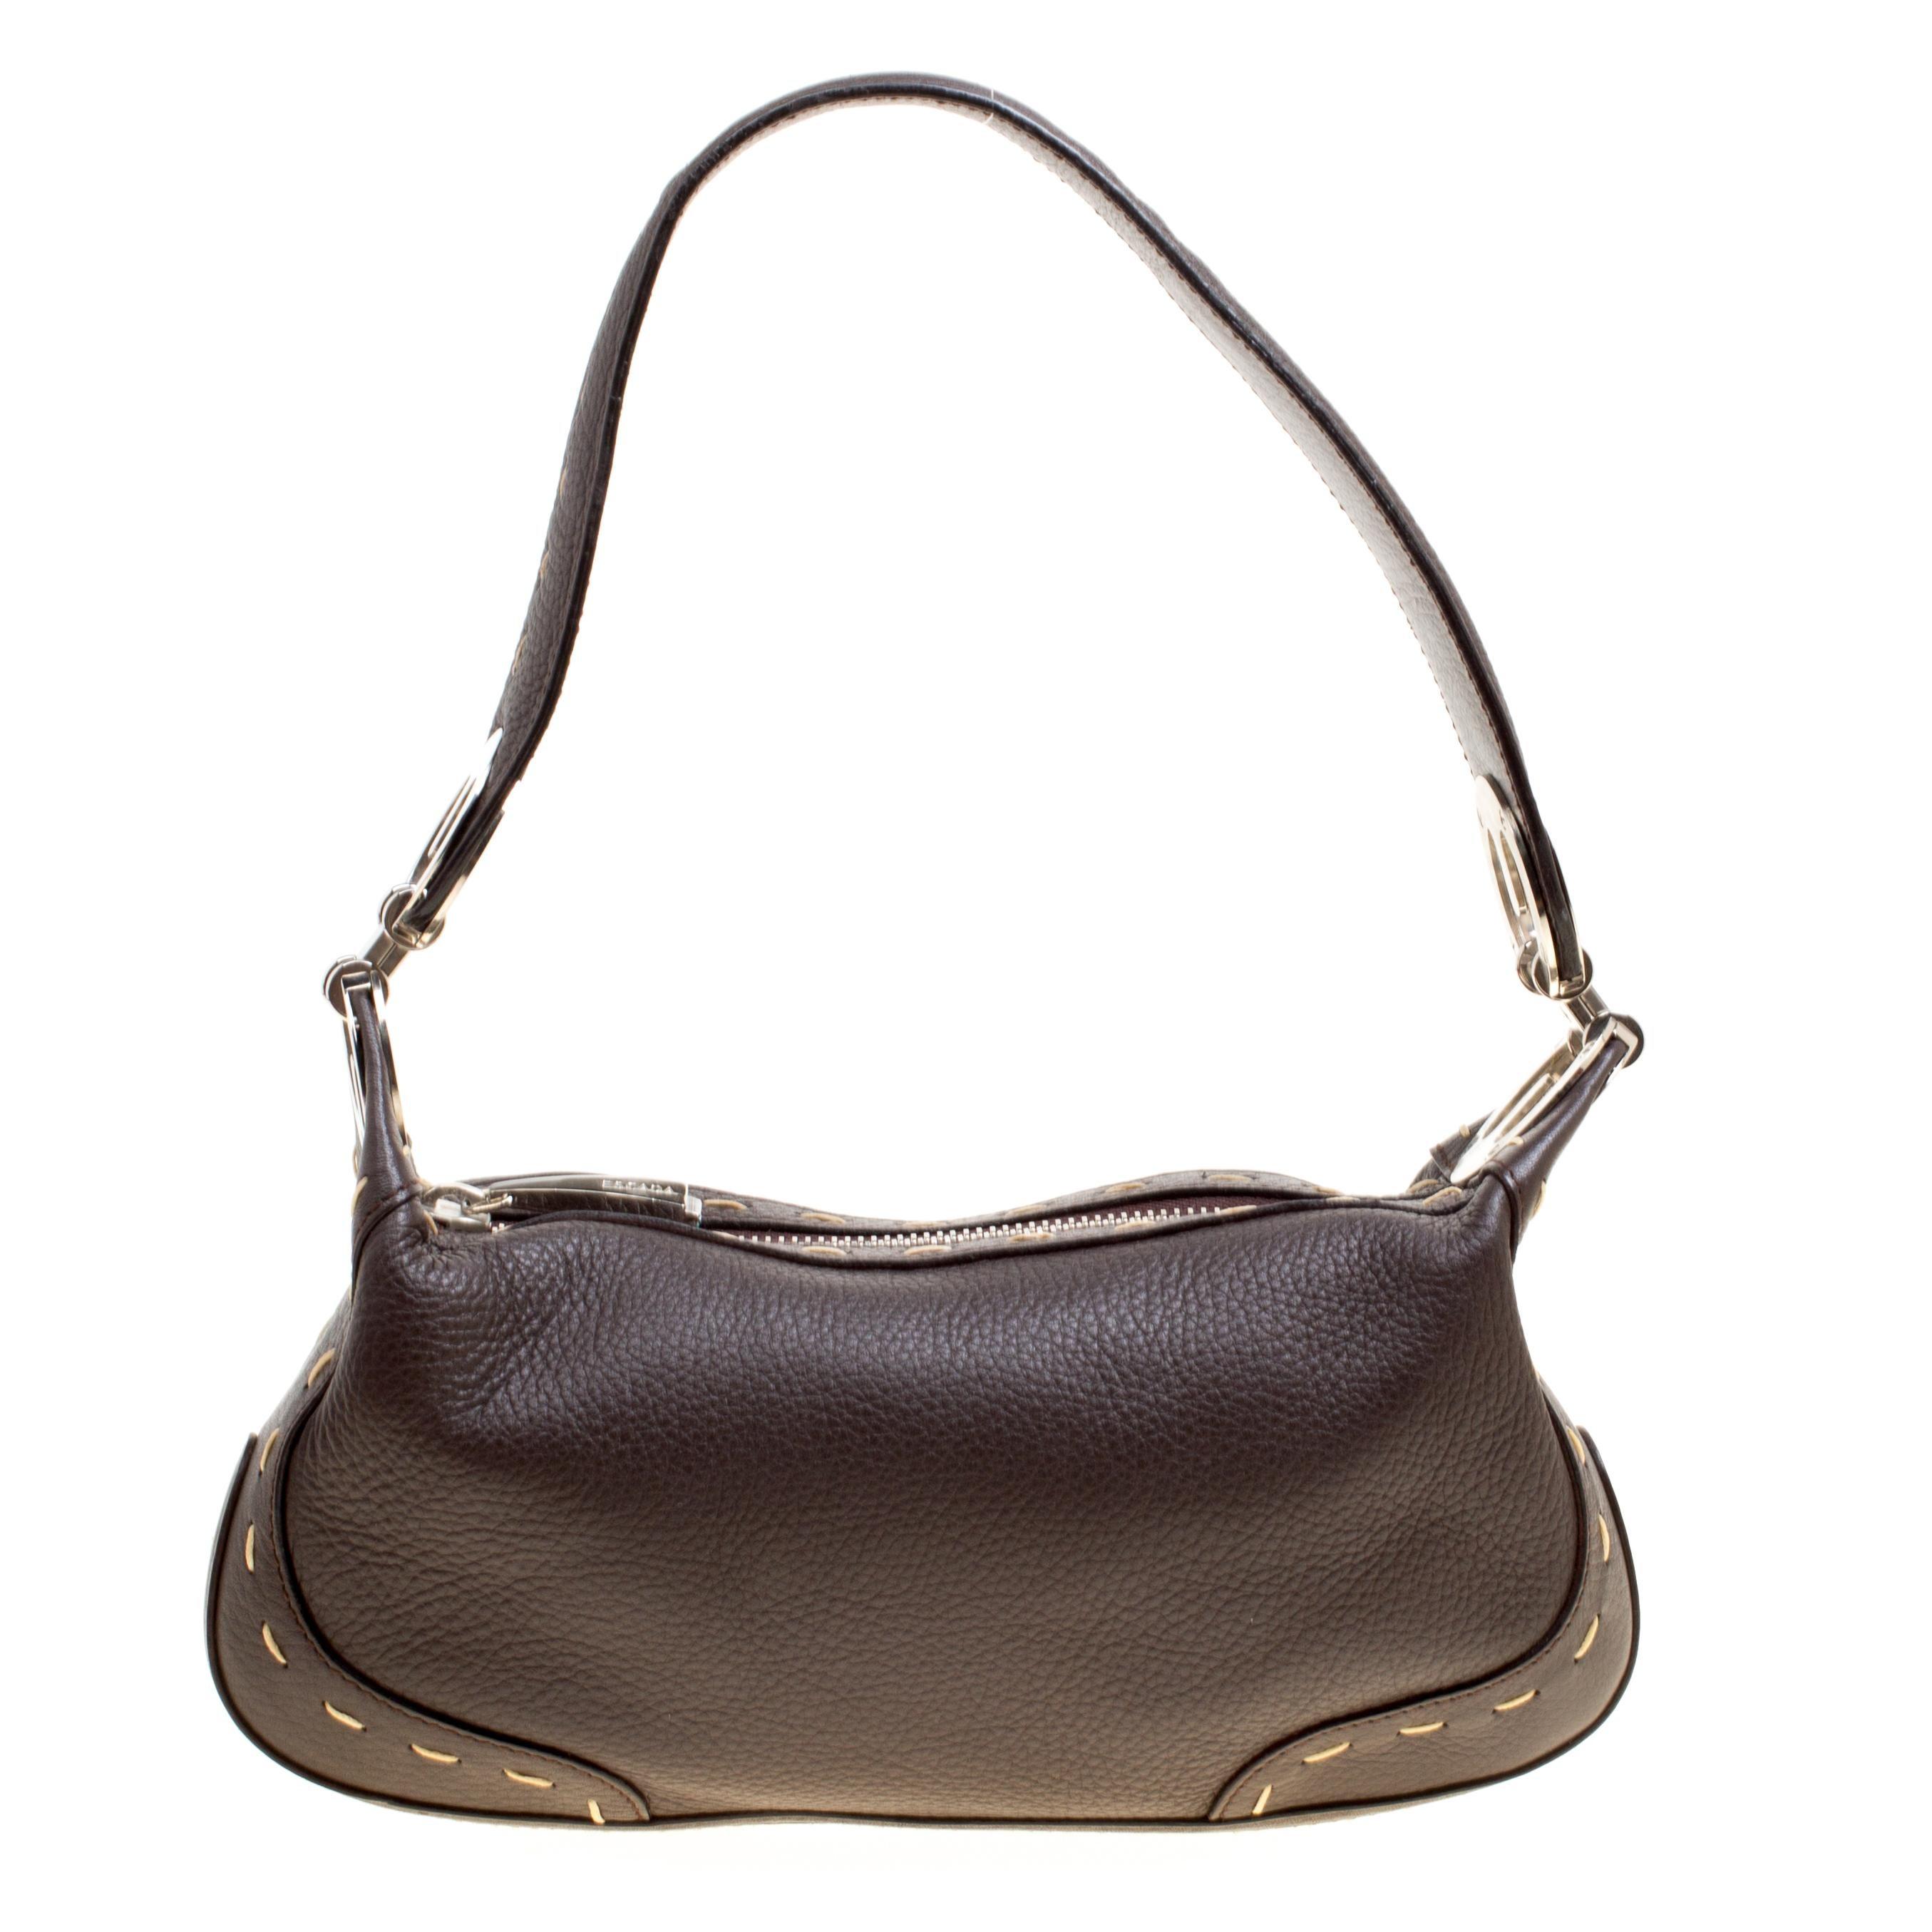 b675690f1d76 Vintage Escada Handbags and Purses - 31 For Sale at 1stdibs